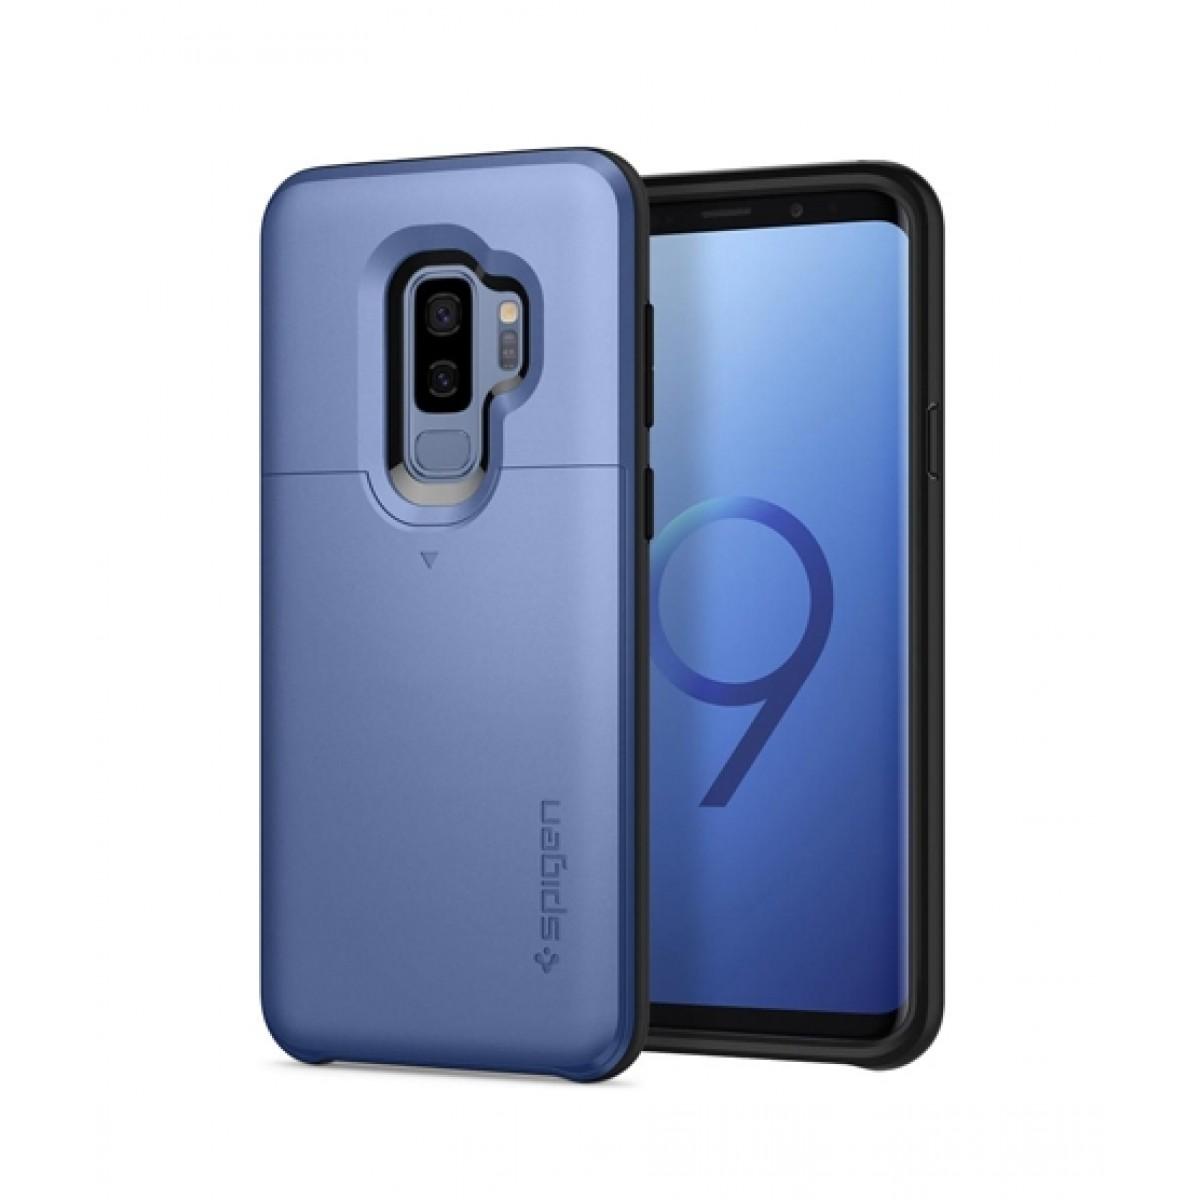 on sale 38f67 7d9a5 Spigen Slim Armor CS Coral Blue Case For Galaxy S9+